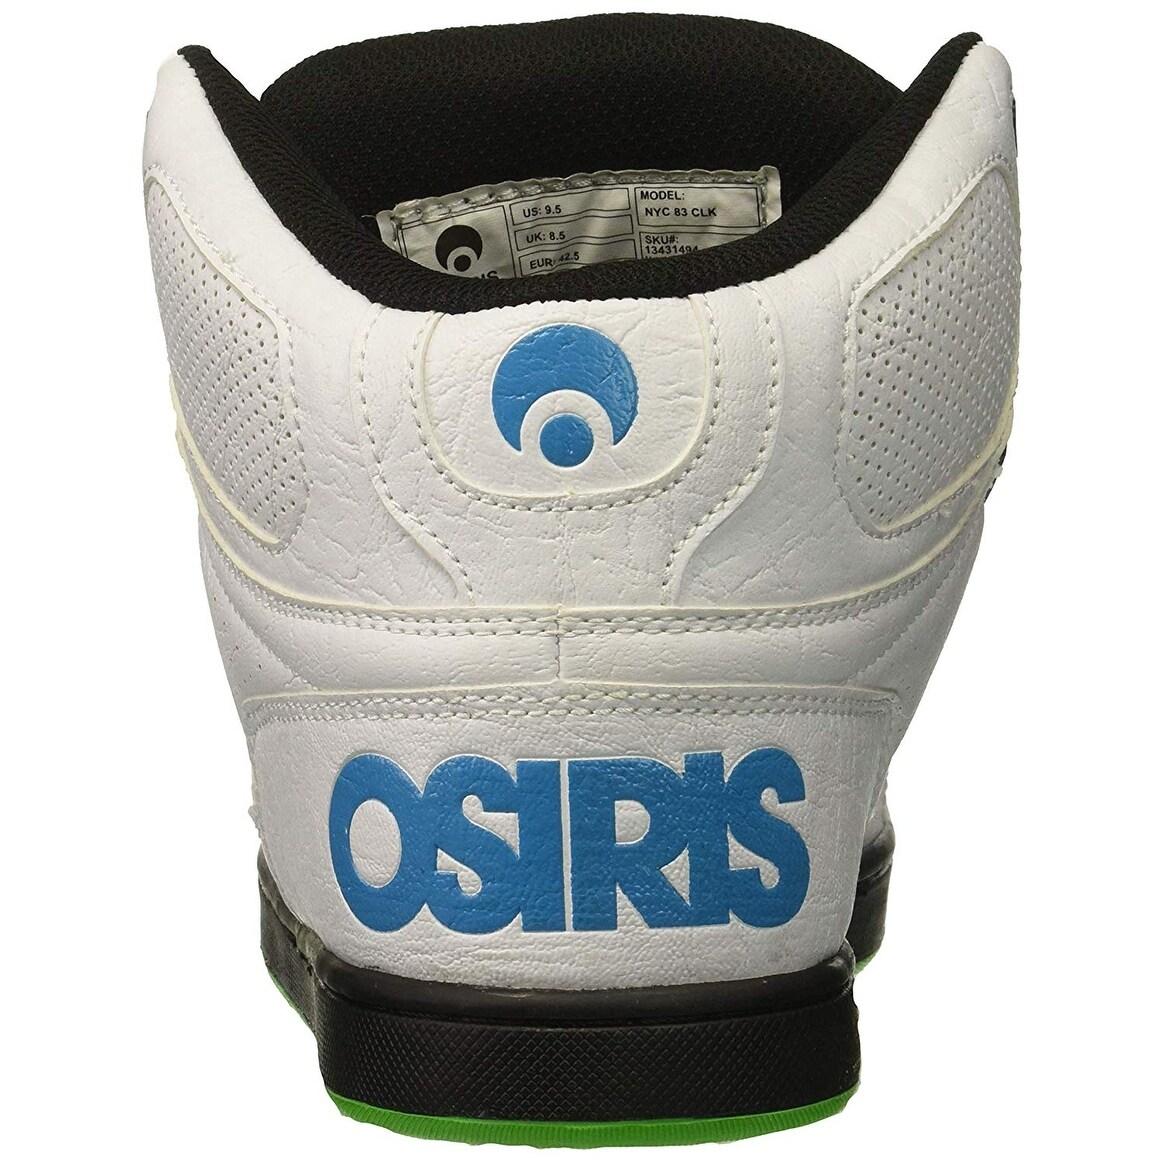 Osiris Shoes Buy Skate Shoes direct from Osiris